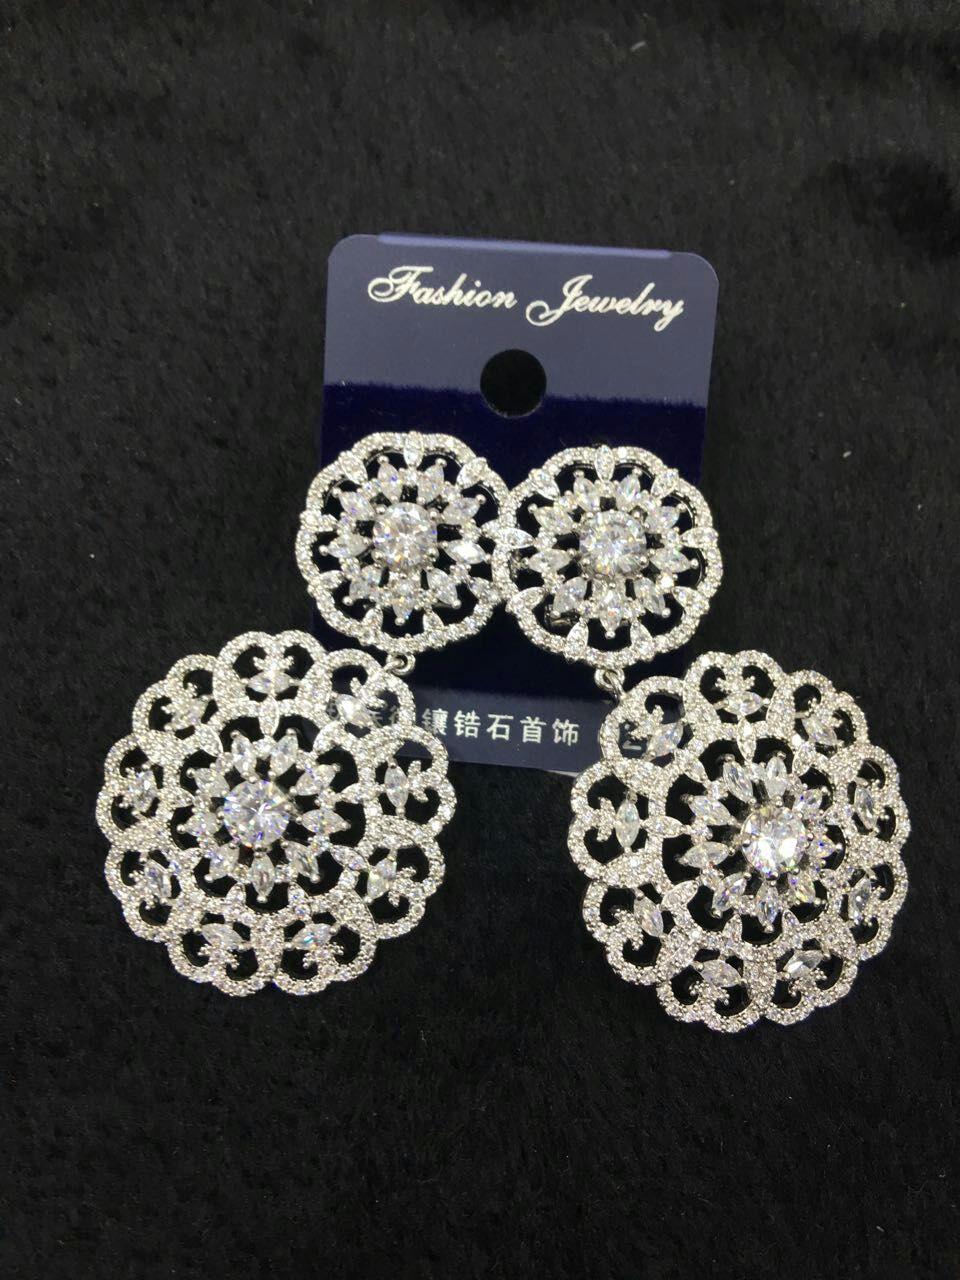 Yulaili New Design Exquisite Gold Jewelry Sets African Womens Necklace Luxury Elegant Wedding Jewelry Set.Yulaili New Design Exquisite Gold Jewelry Sets African Womens Necklace Luxury Elegant Wedding Jewelry Set.